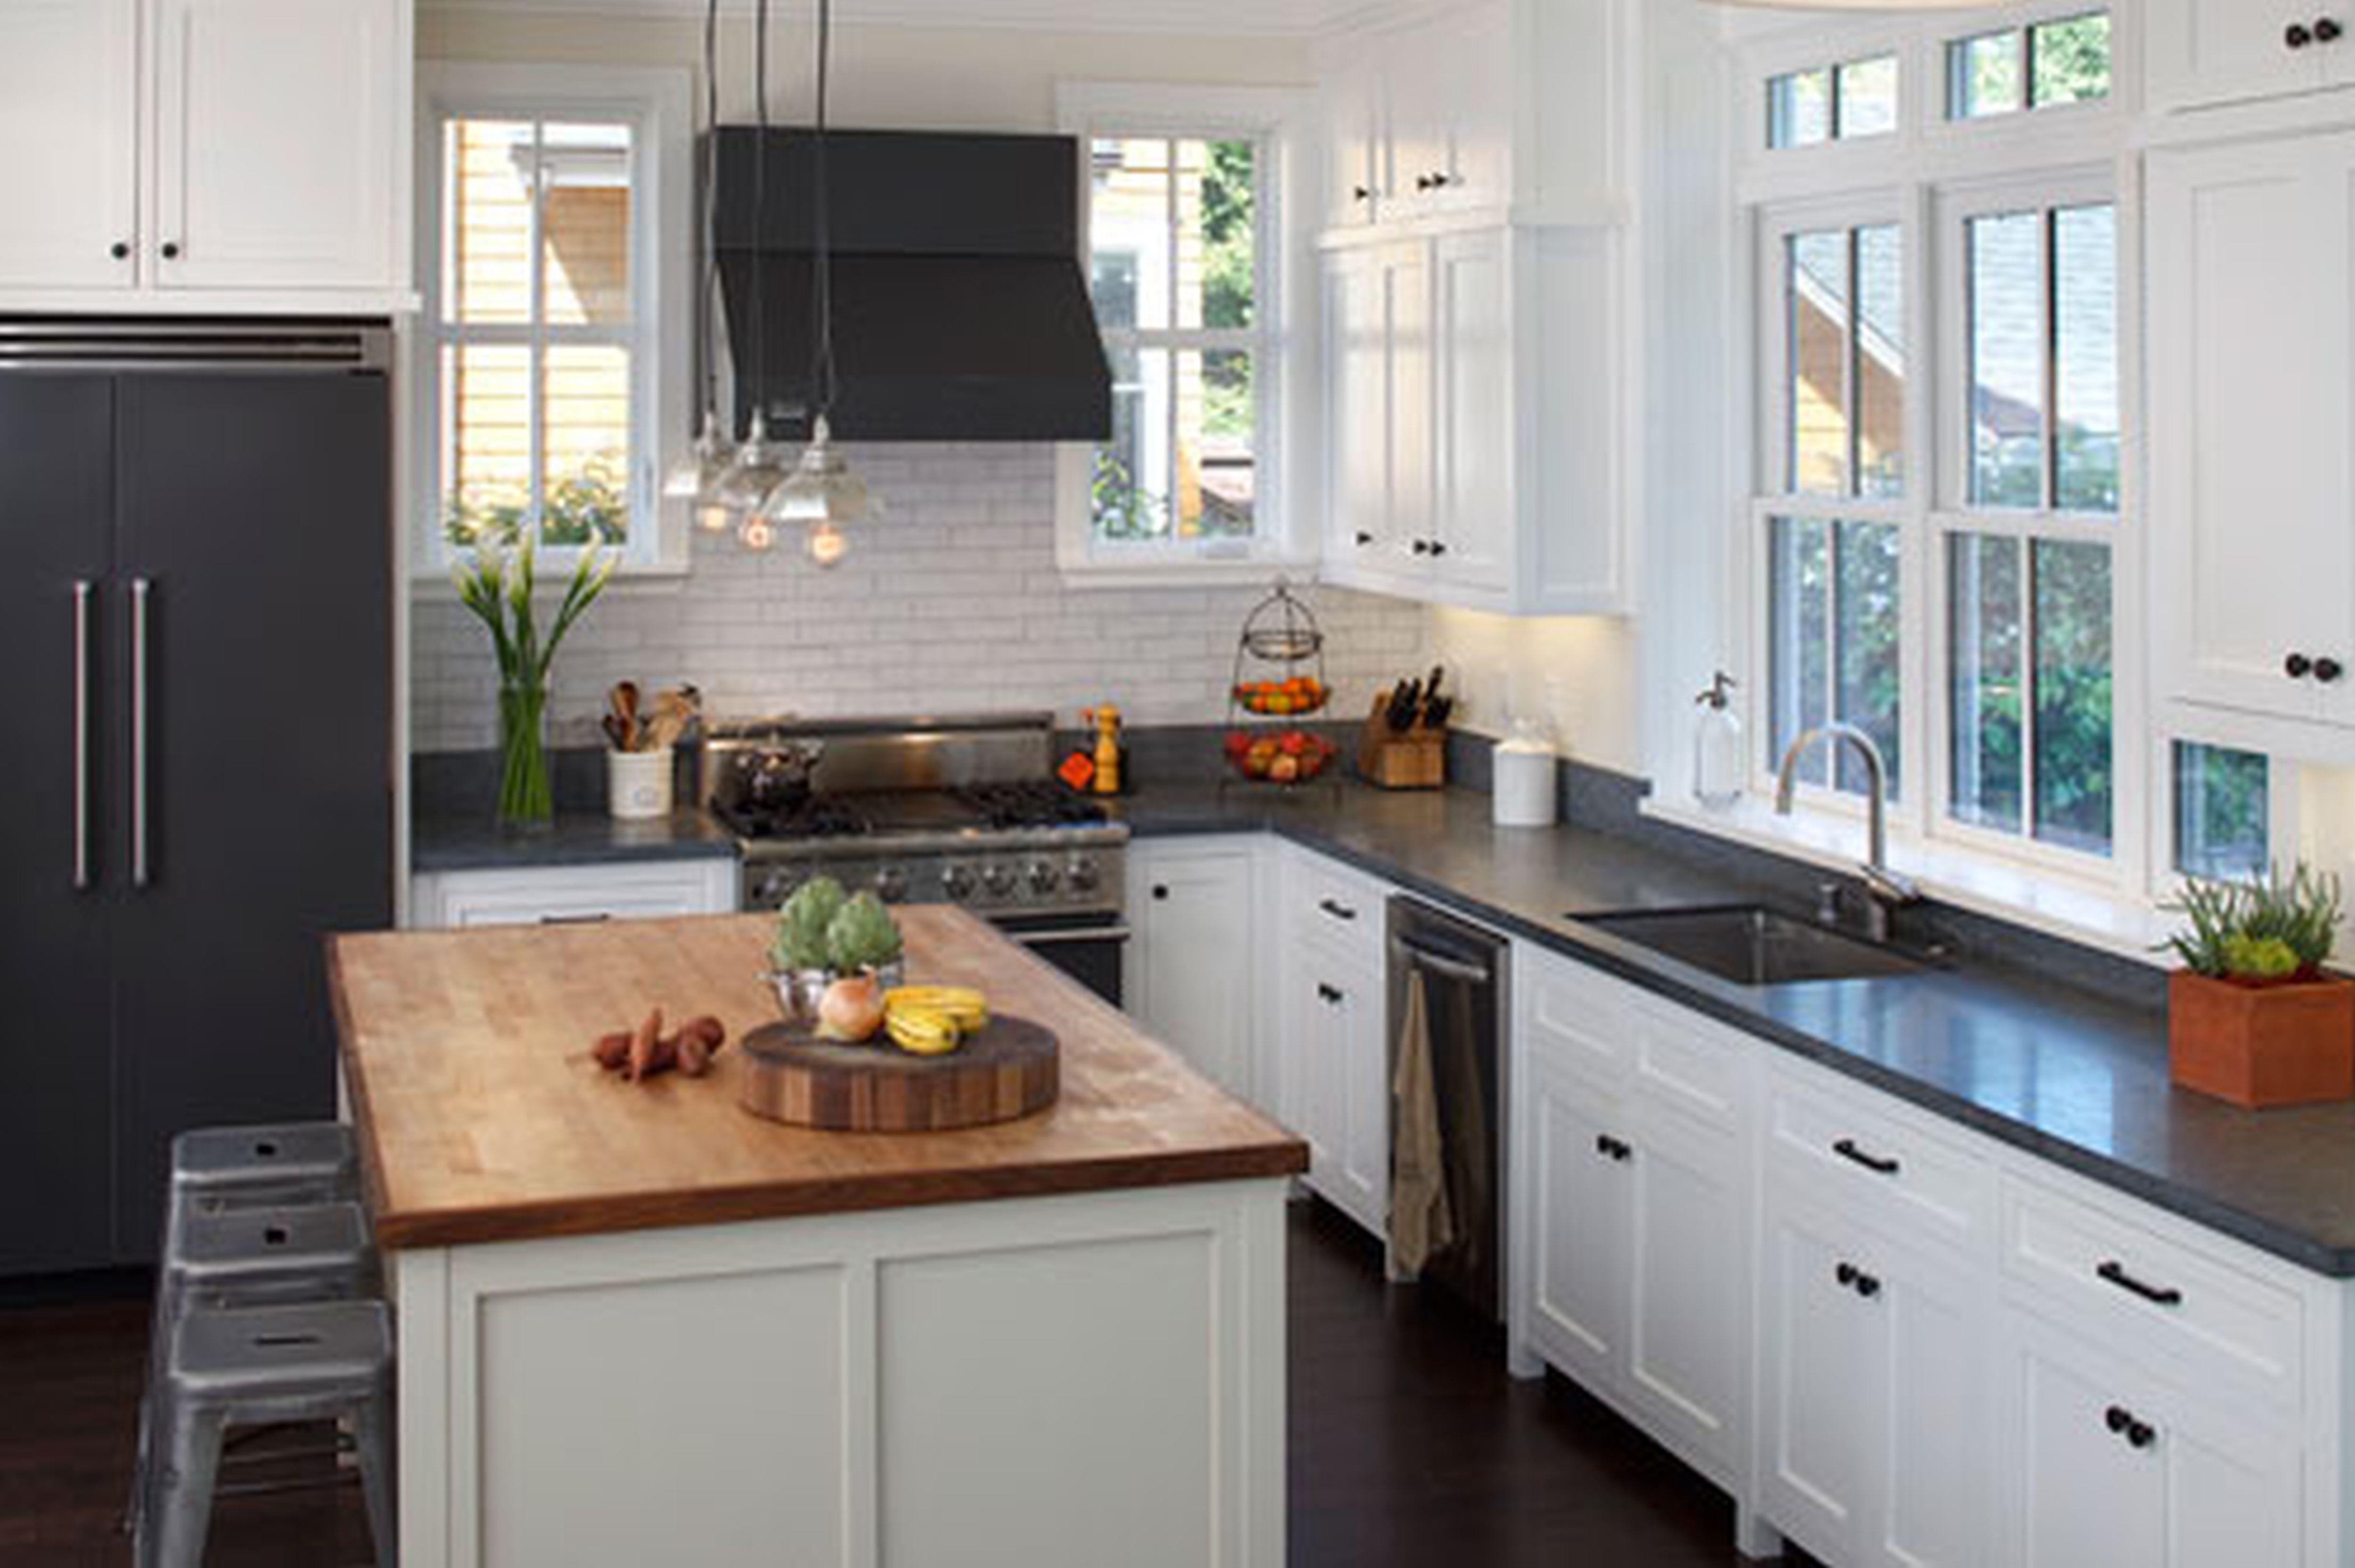 kitchen ideas white cabinets black countertop photo - 8